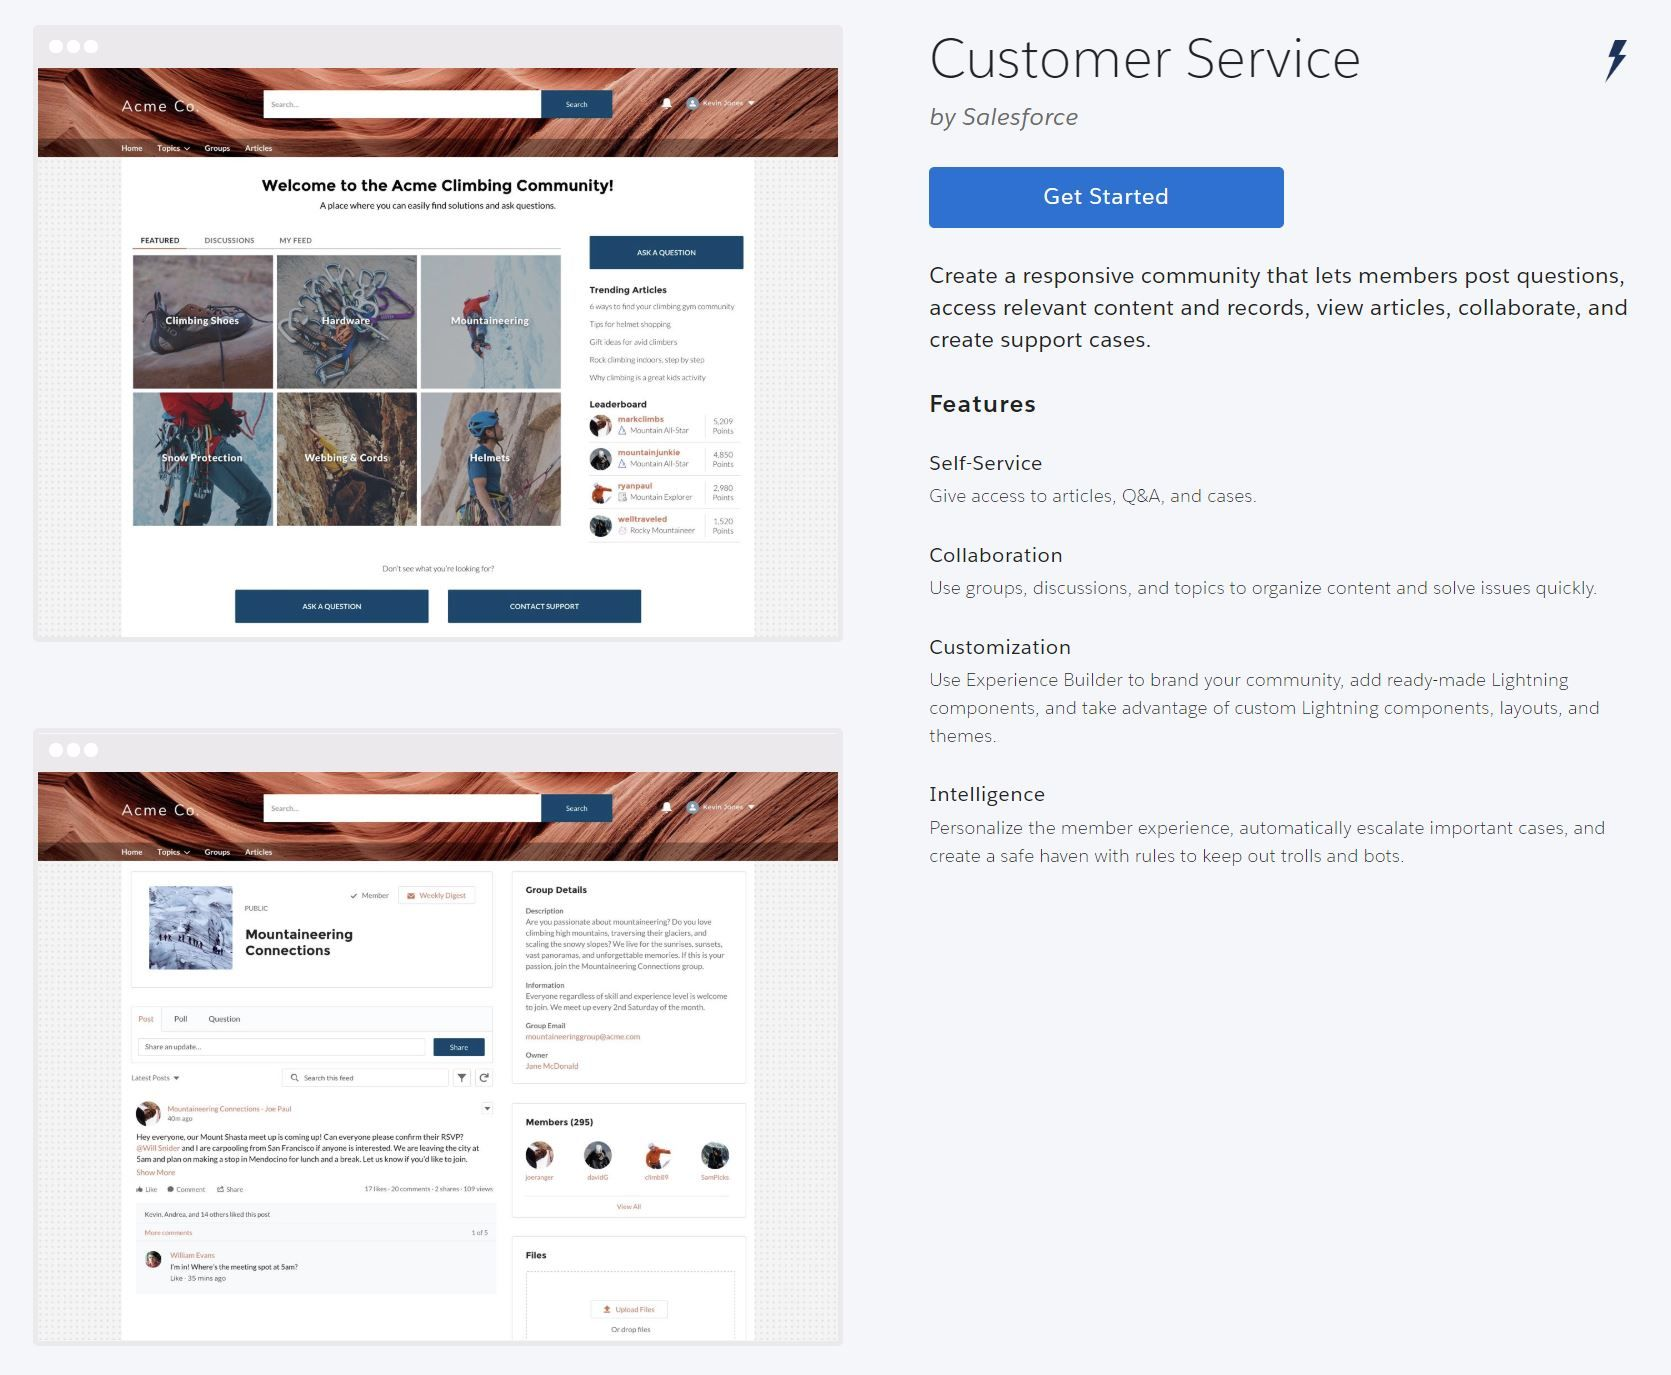 template-customer-service